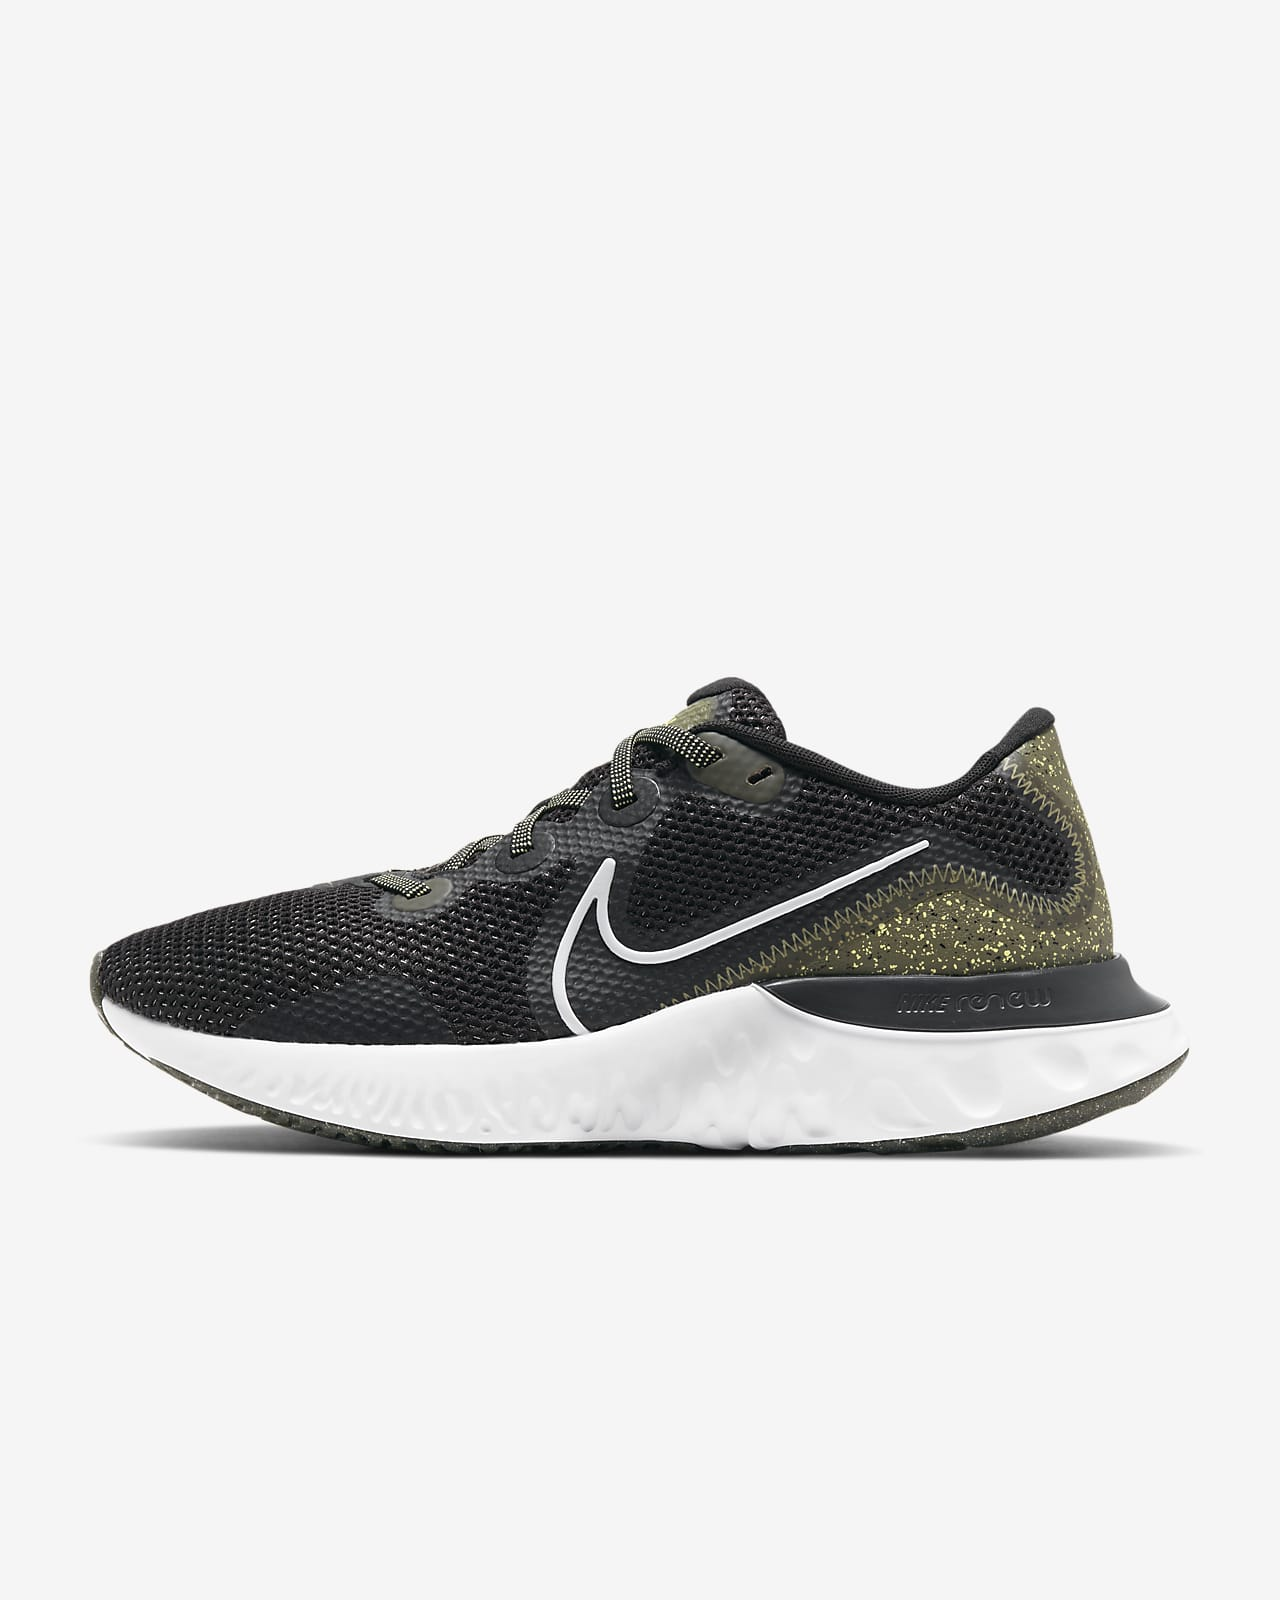 Nike Renew Run Special Edition Men's